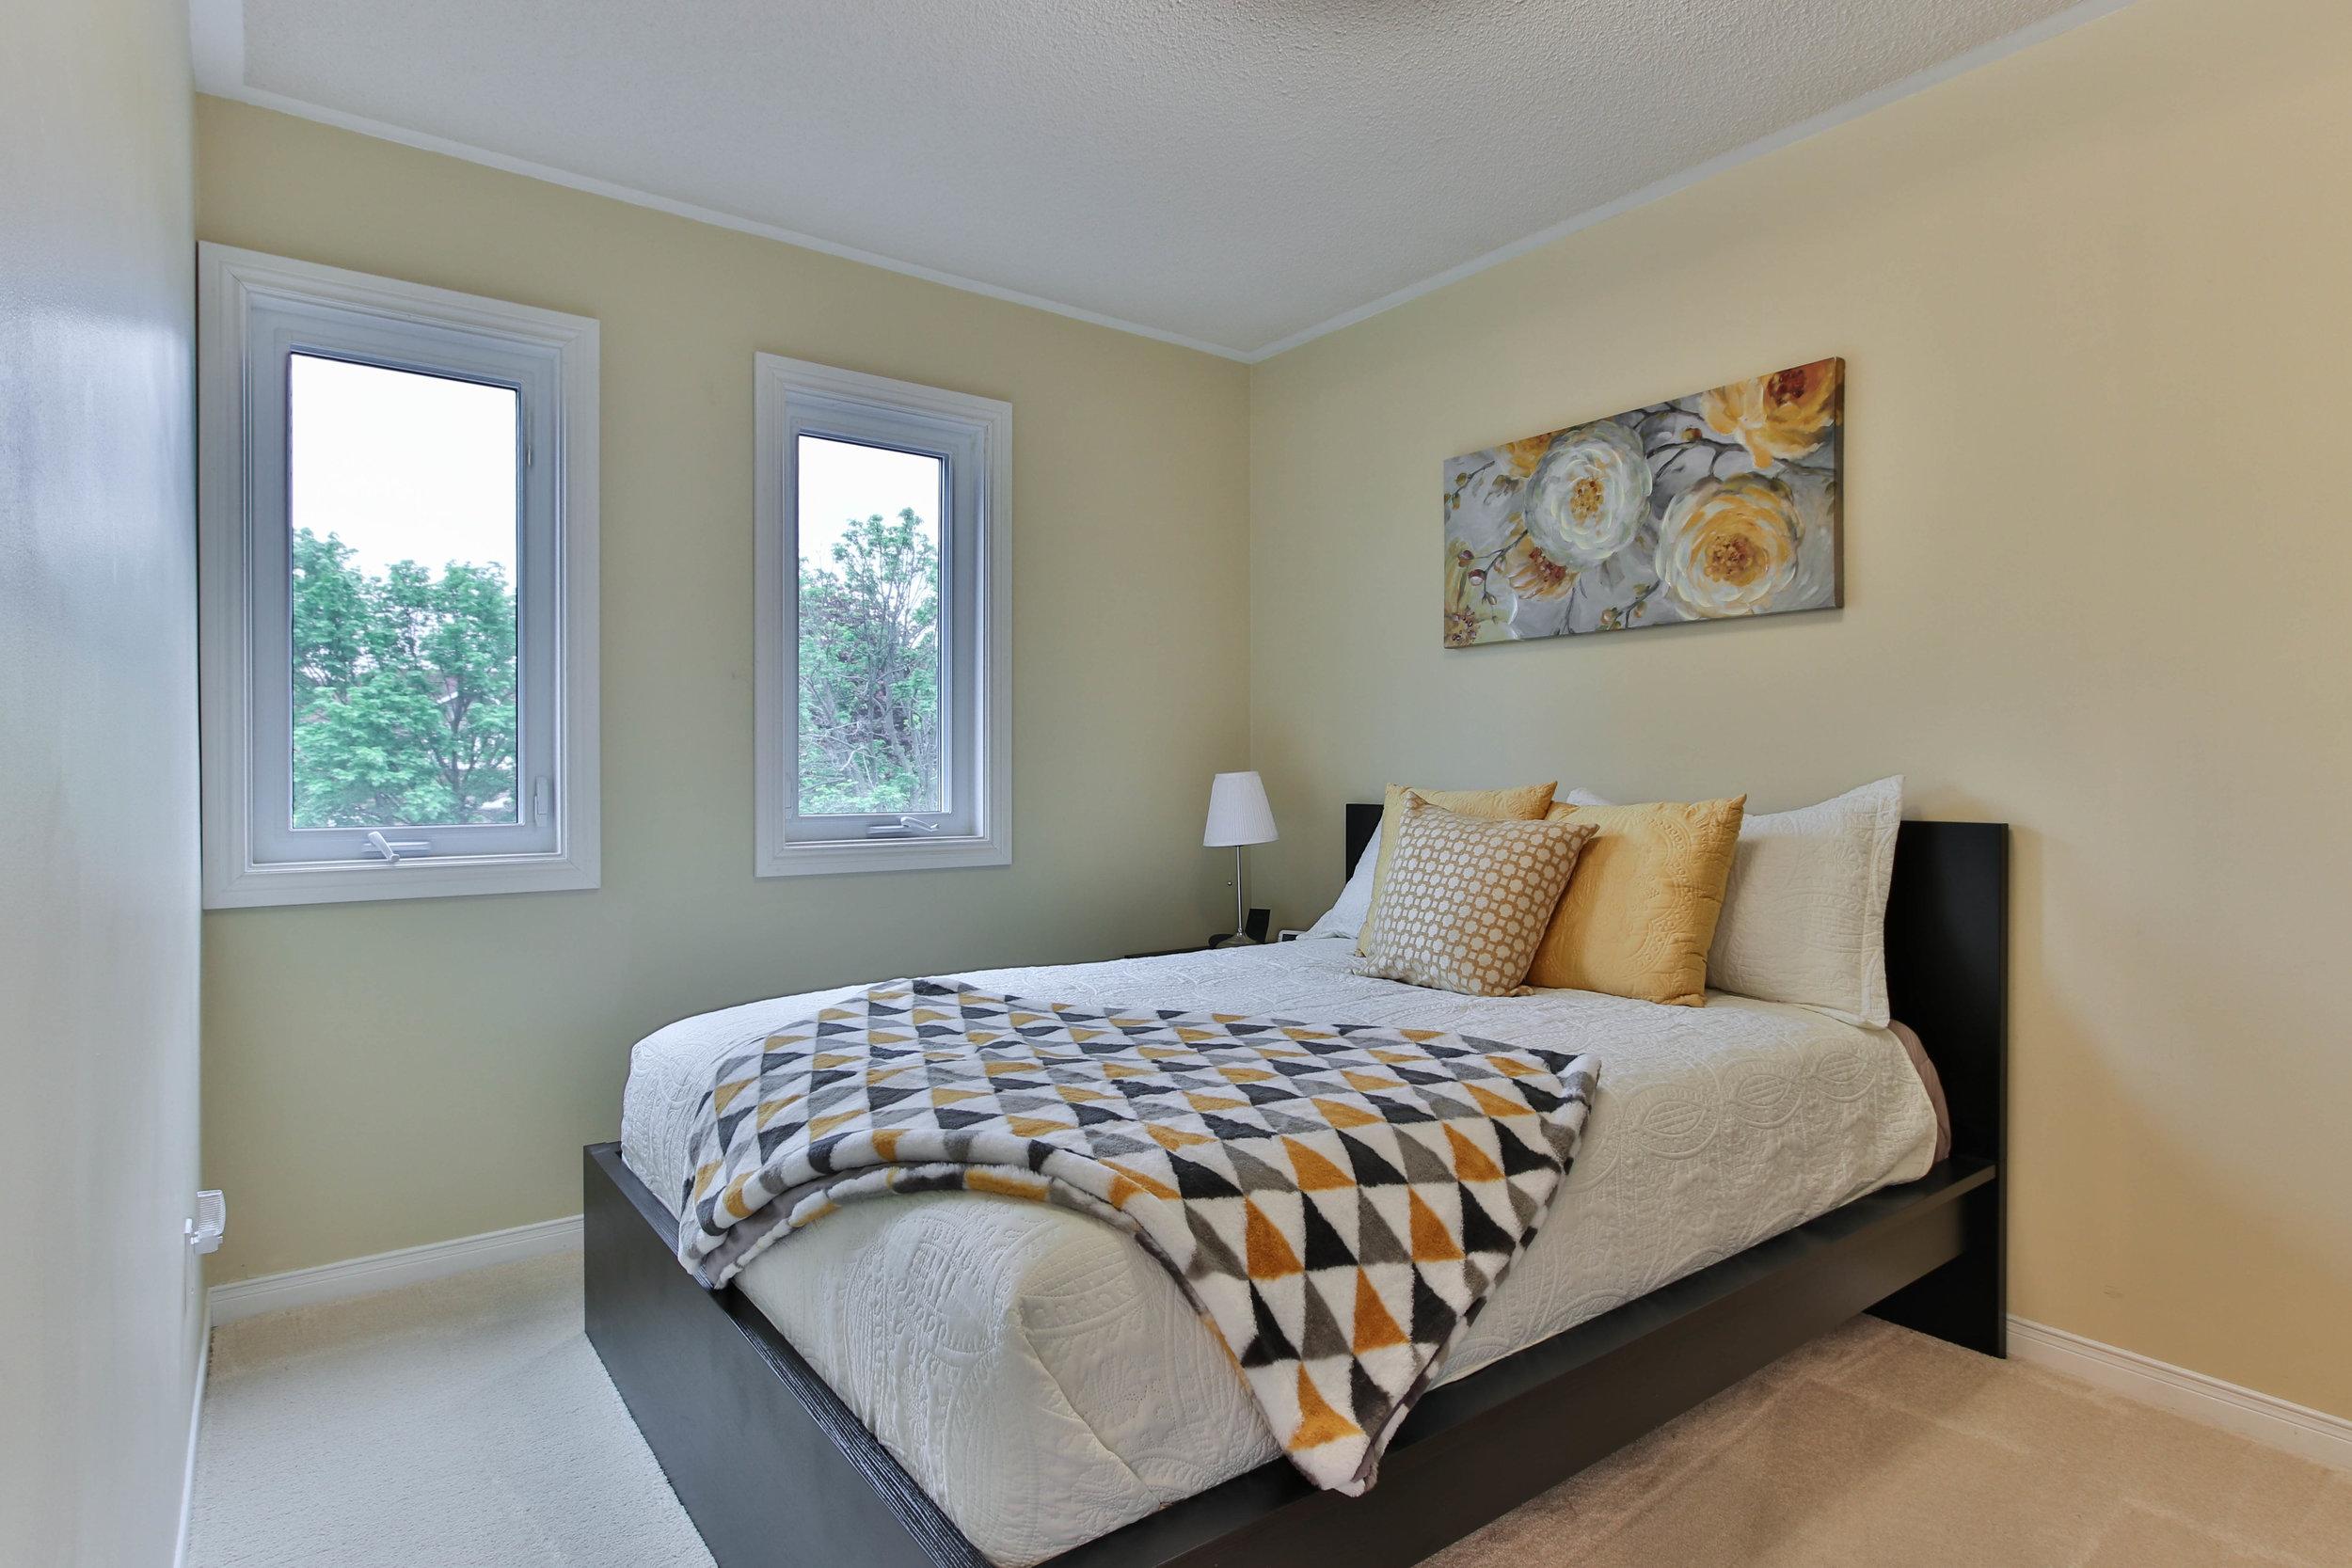 31_Bedroom.jpg